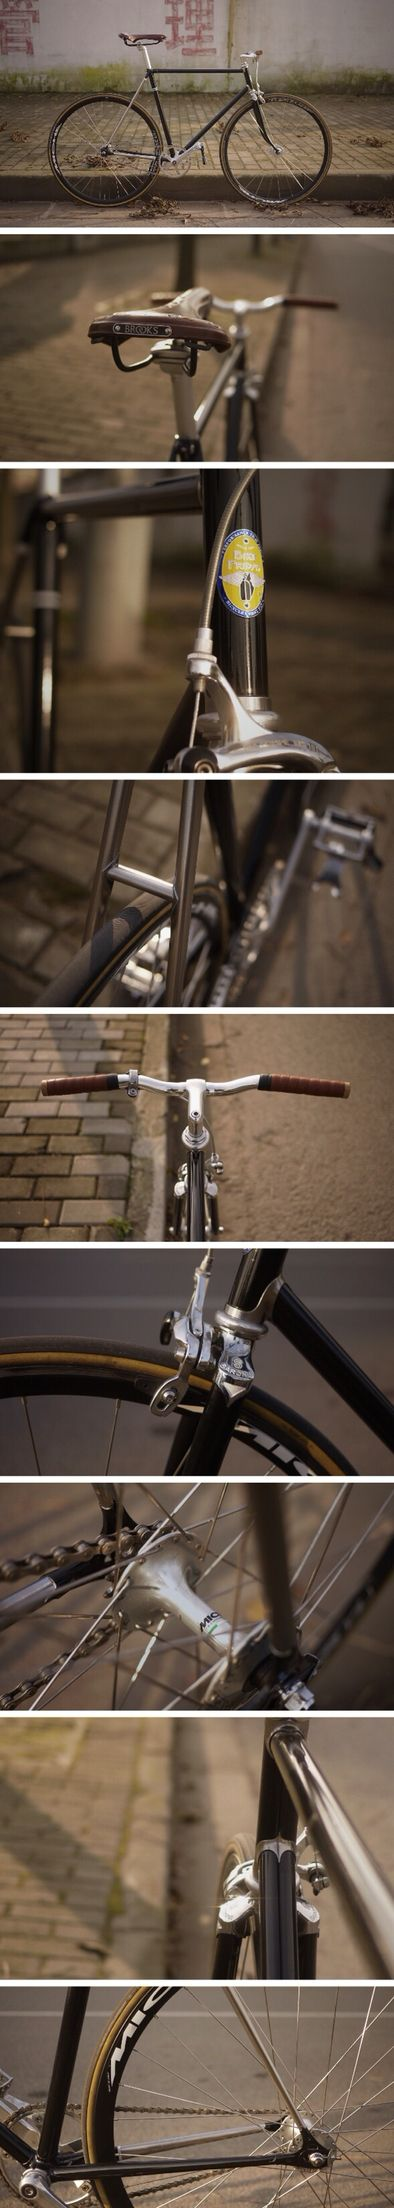 Samson njs fixie bike.Classic bicycle  Art&Design @classic_car_art #ClassicCarArtDesign